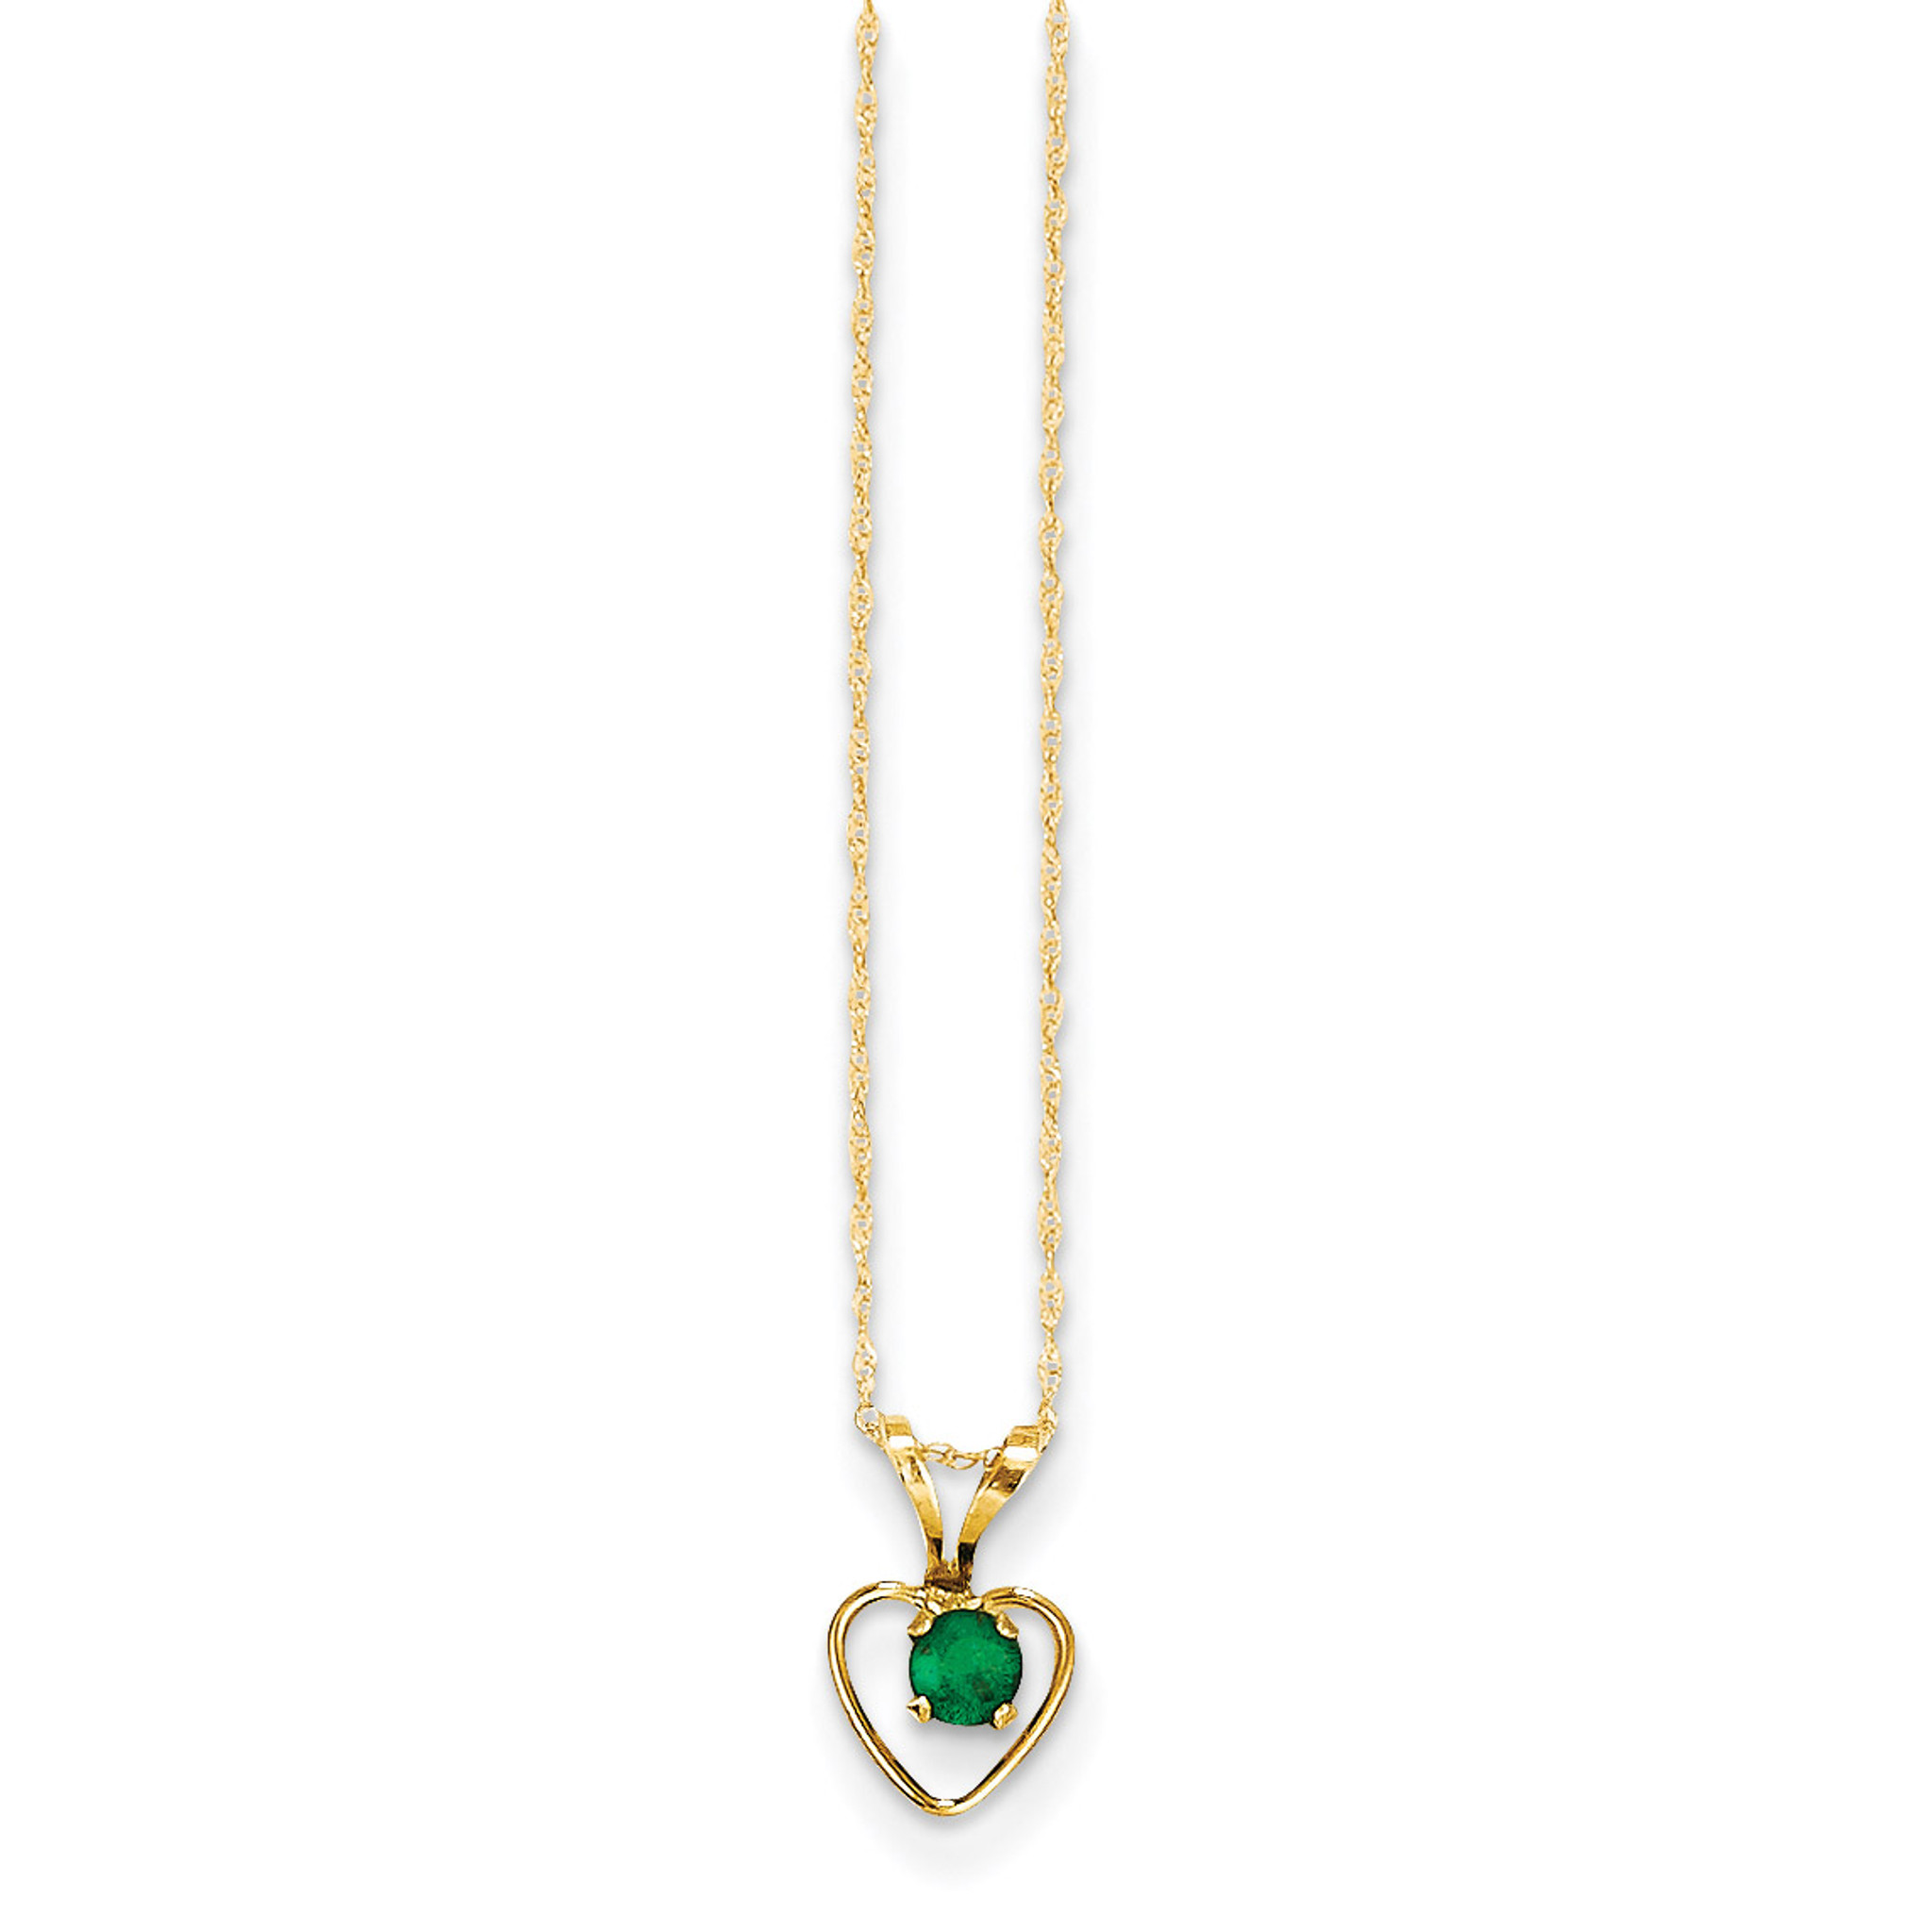 14K Madi K 3mm Peridot Heart Birthstone Necklace